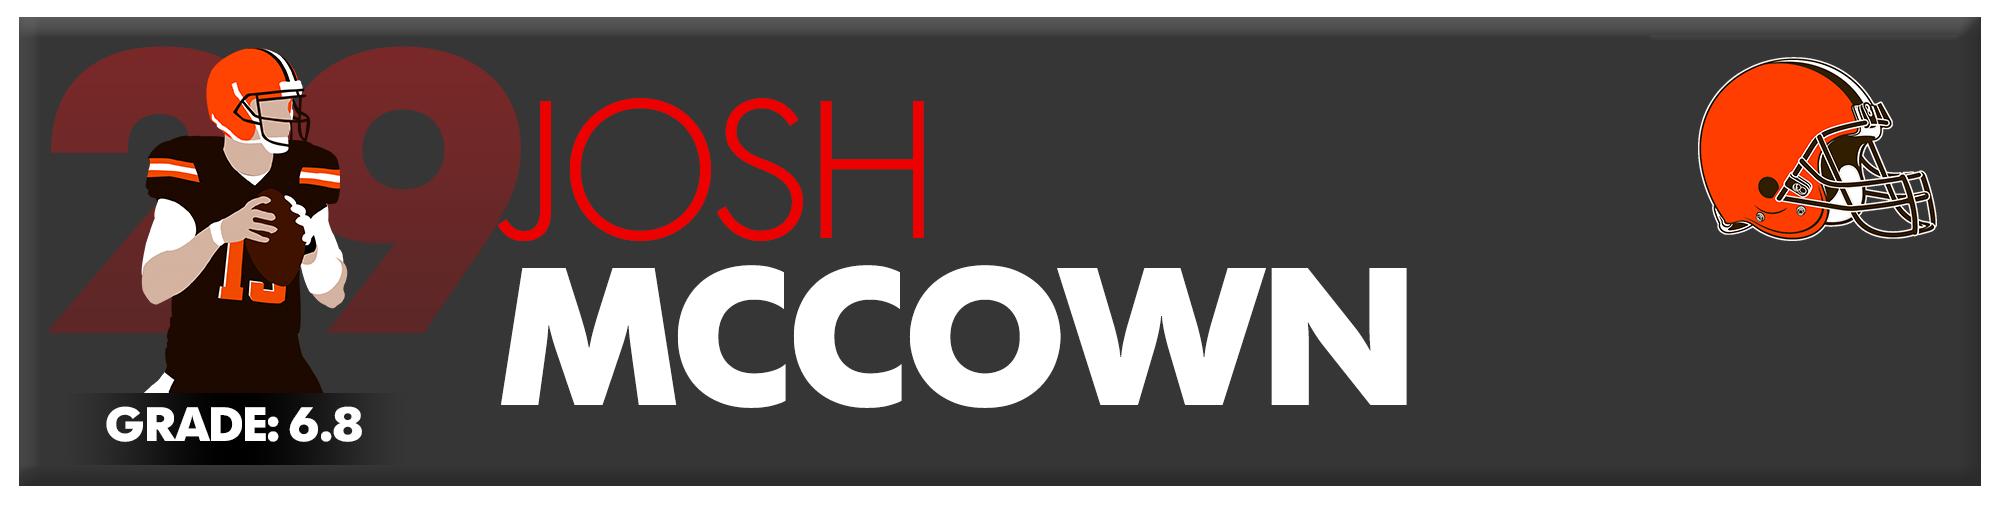 mccown_tile